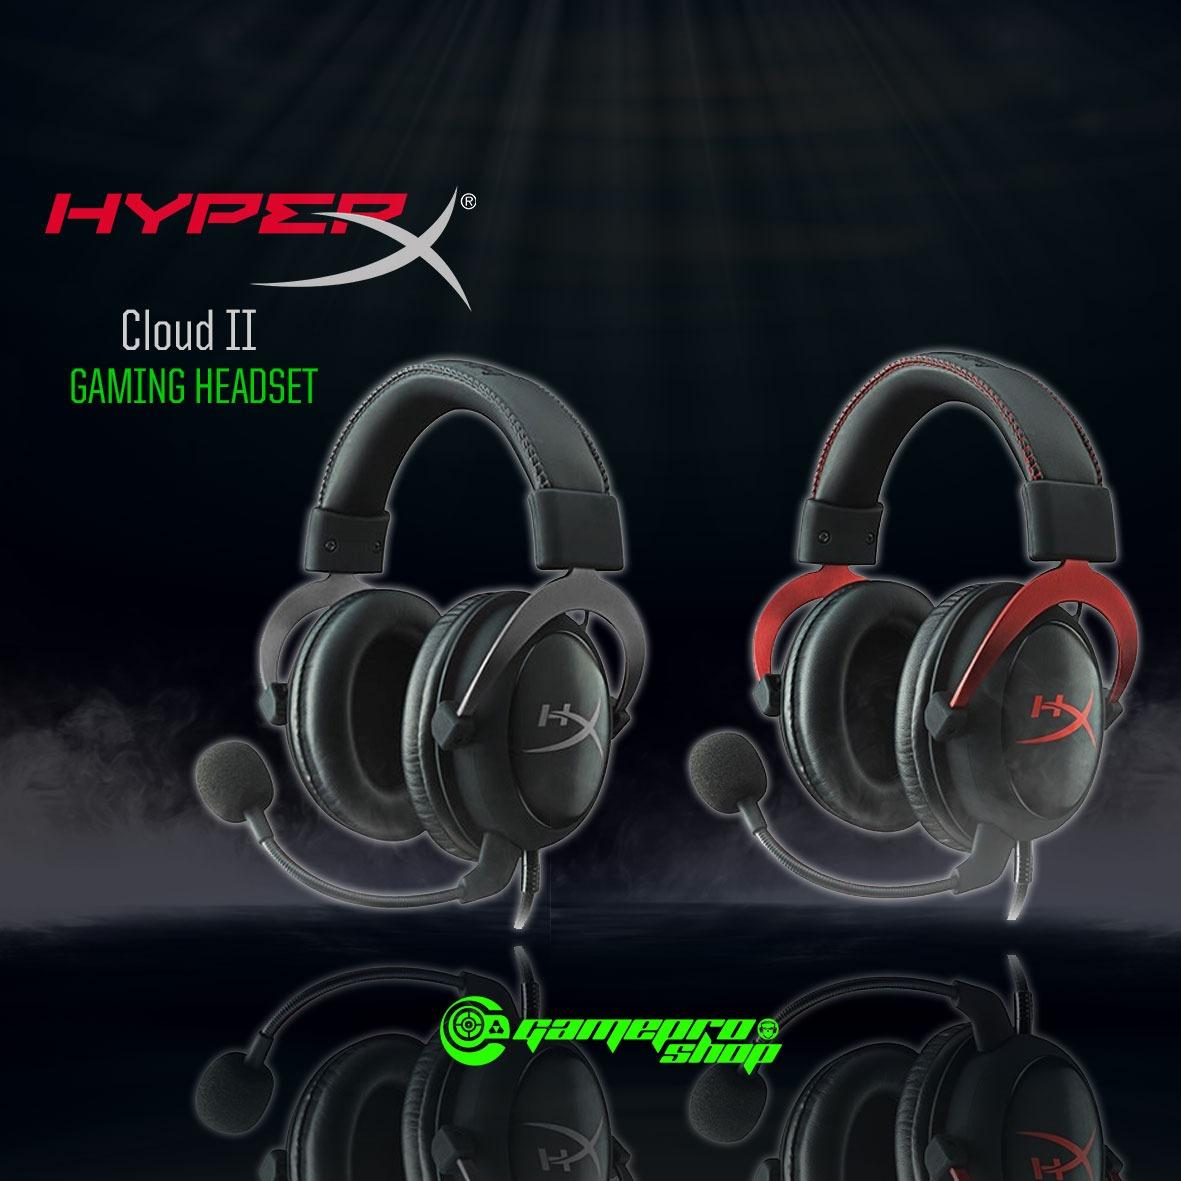 Sale Hyperx Cloud Ii Headset Black Red Gss Promo Kingston Wholesaler